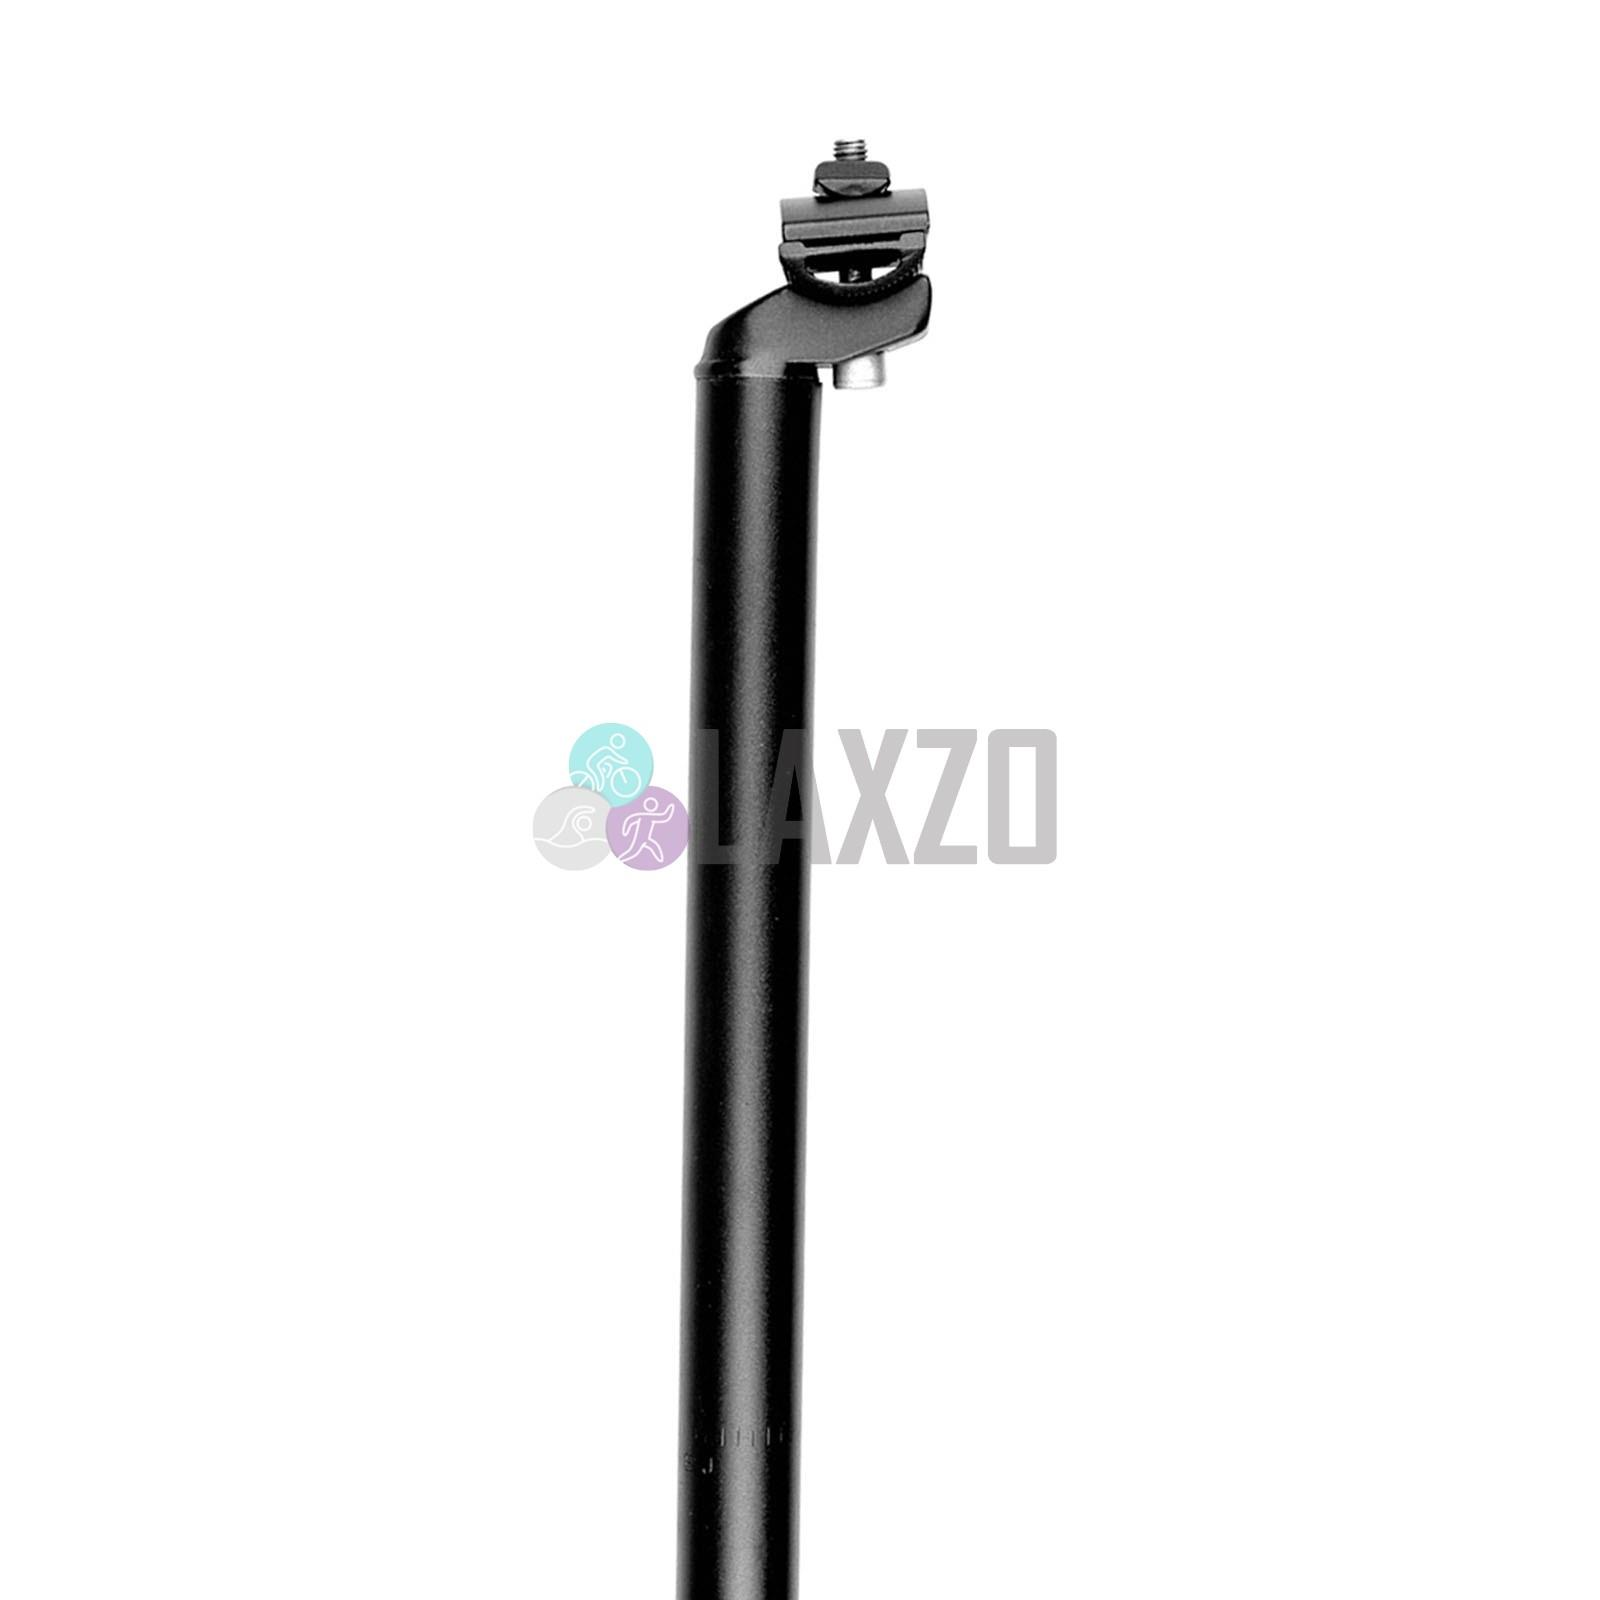 Bike Seat Post Ergotec Patent Micro Alloy Bicyle in Black 26.0mm